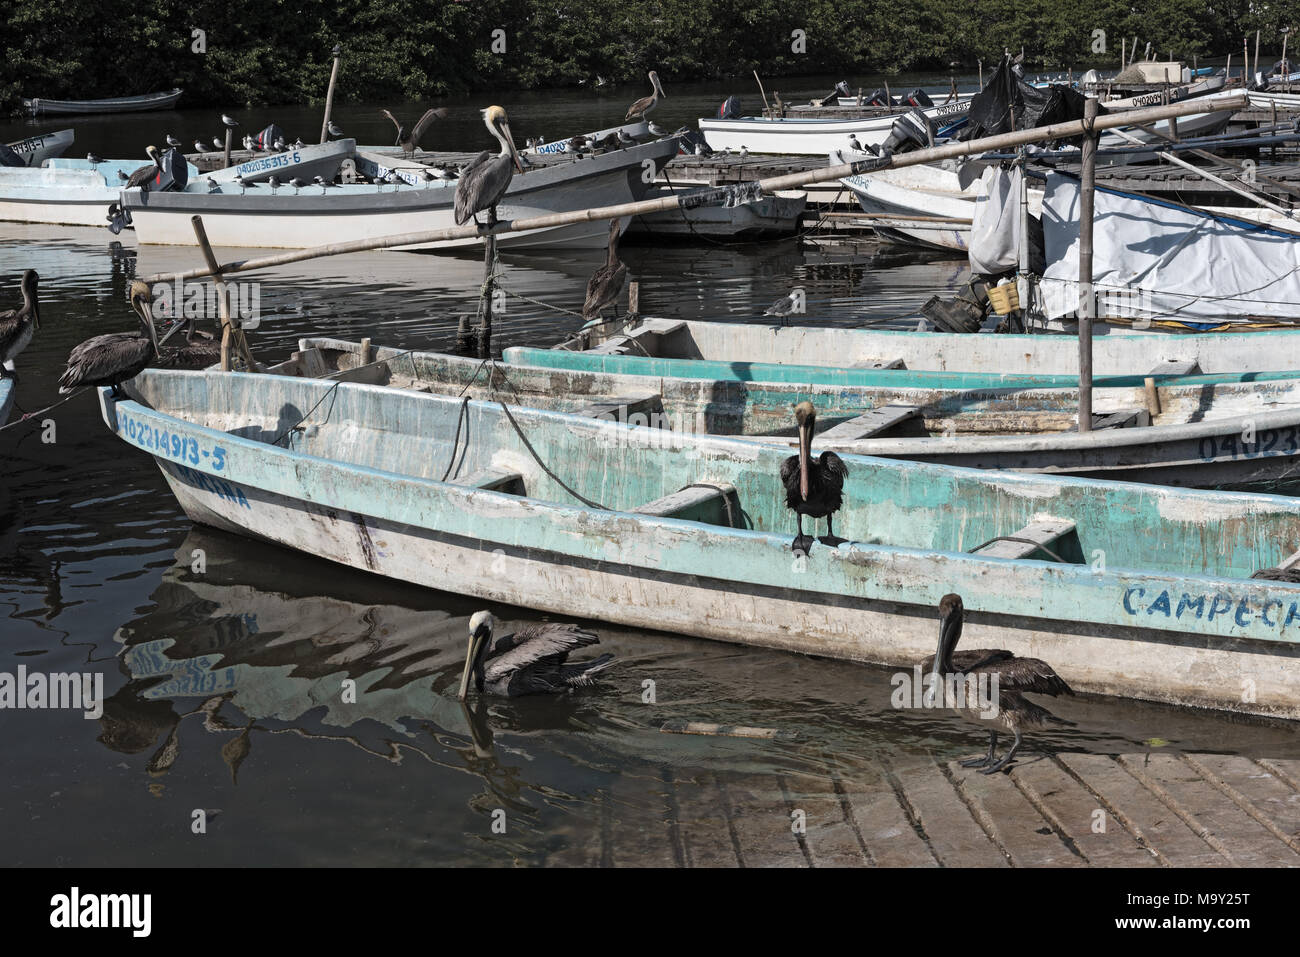 Fischerboote in der darsena de San Francisco, Campeche, Mexiko Stockbild